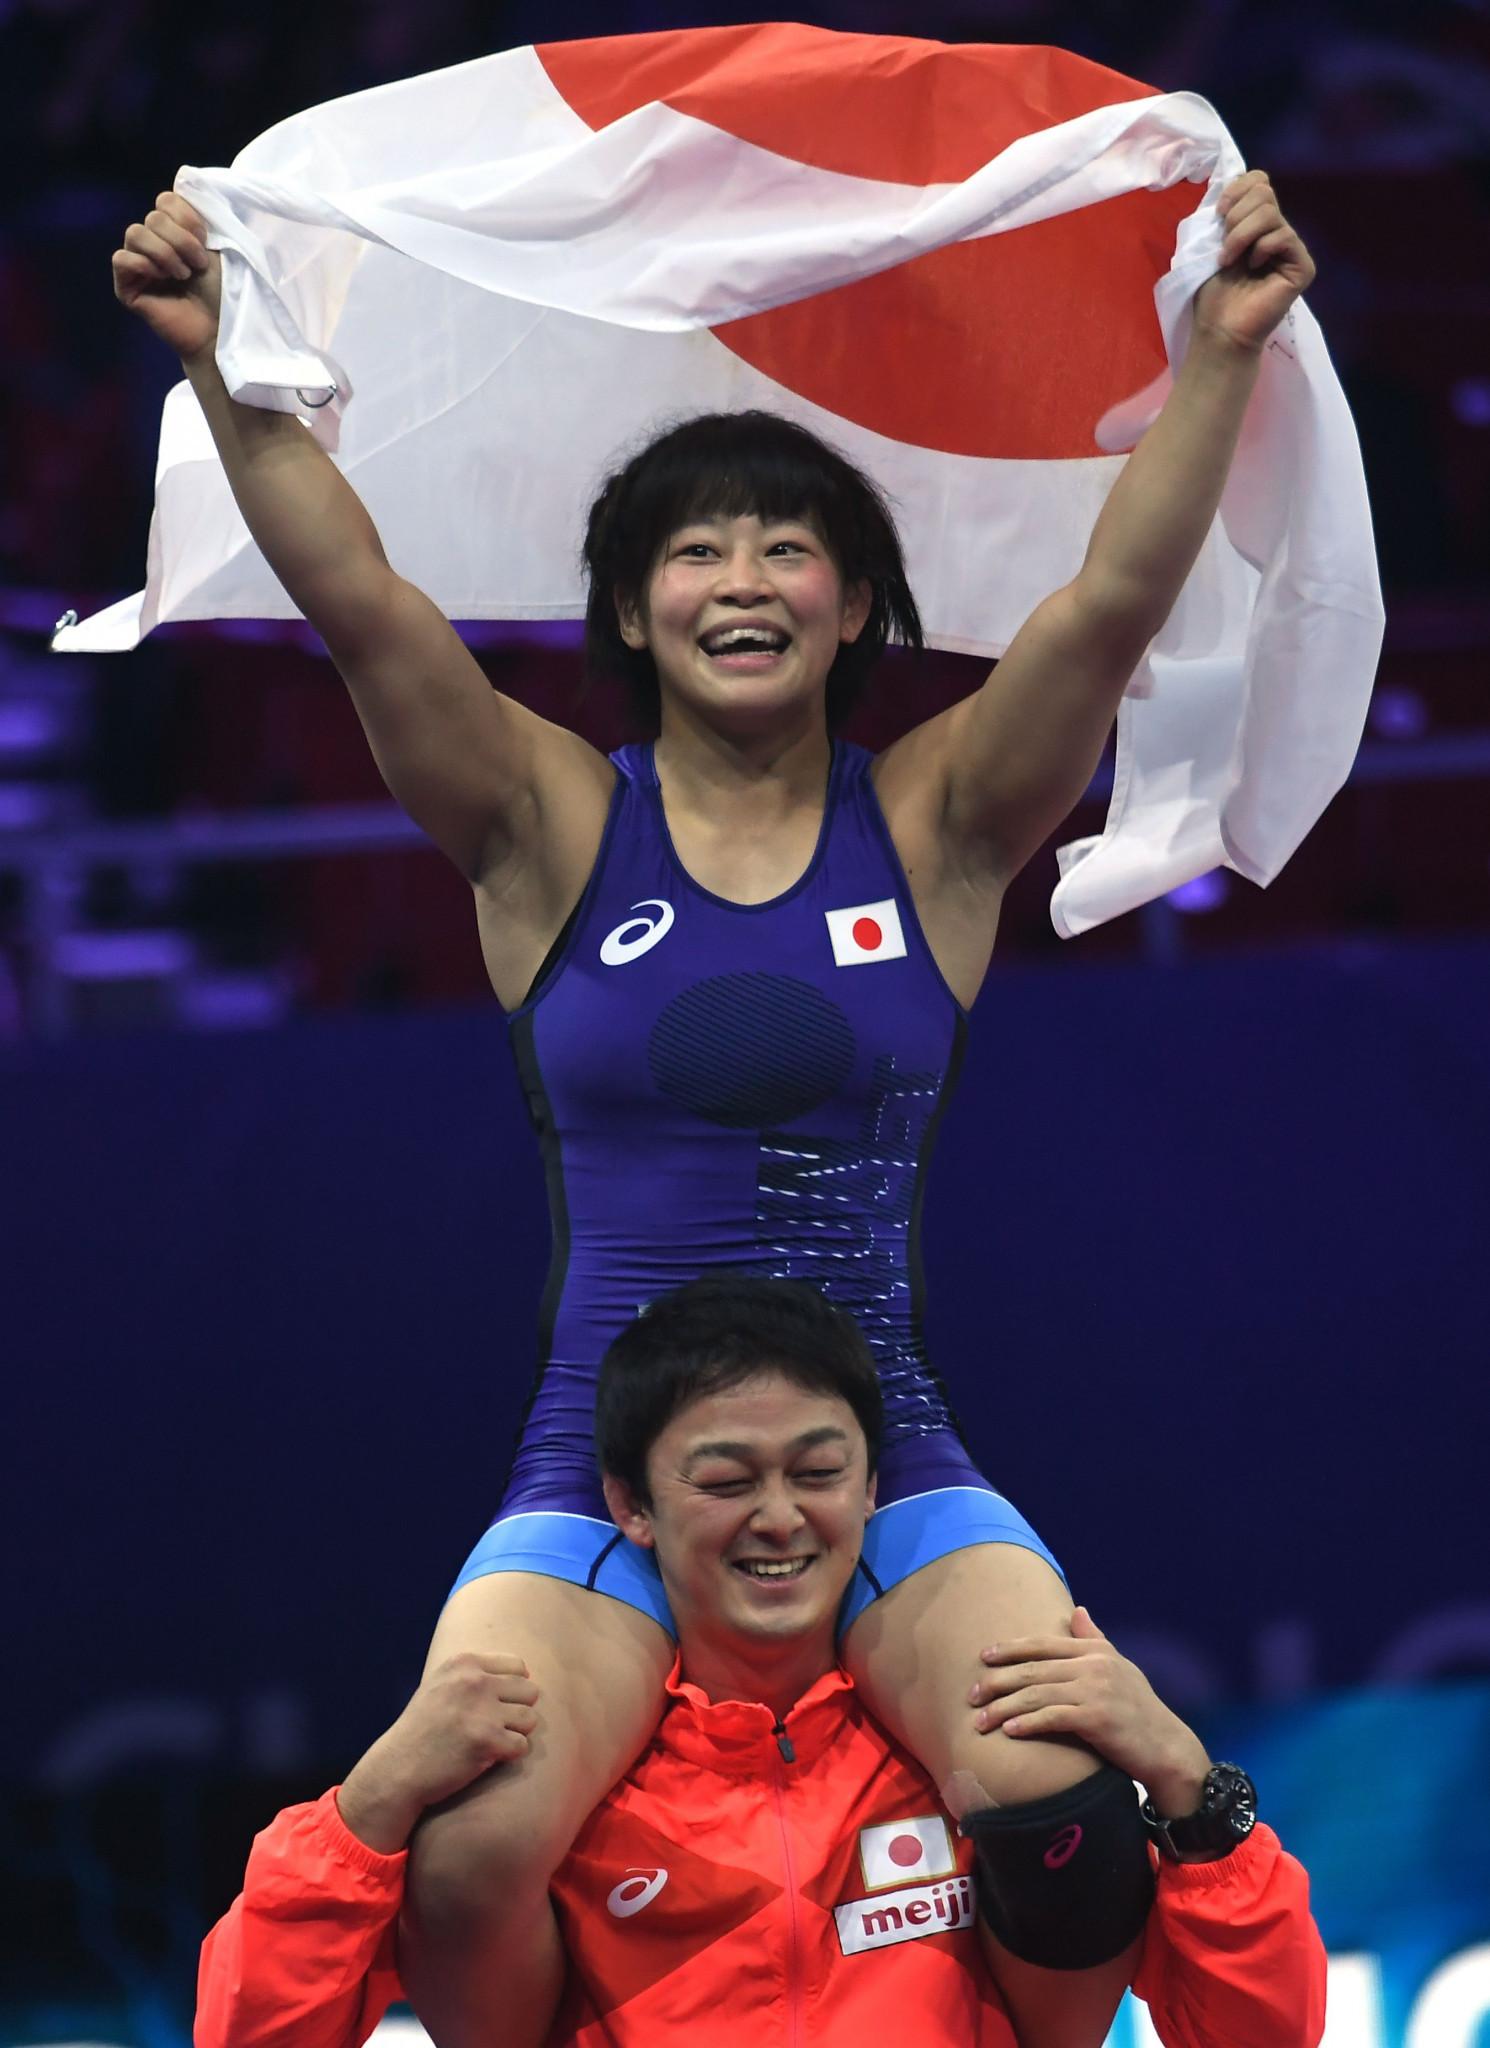 Japan won both women's golds tonight thanks to Mayu Mukaida, pictured, and Risako Kawai ©Getty Images